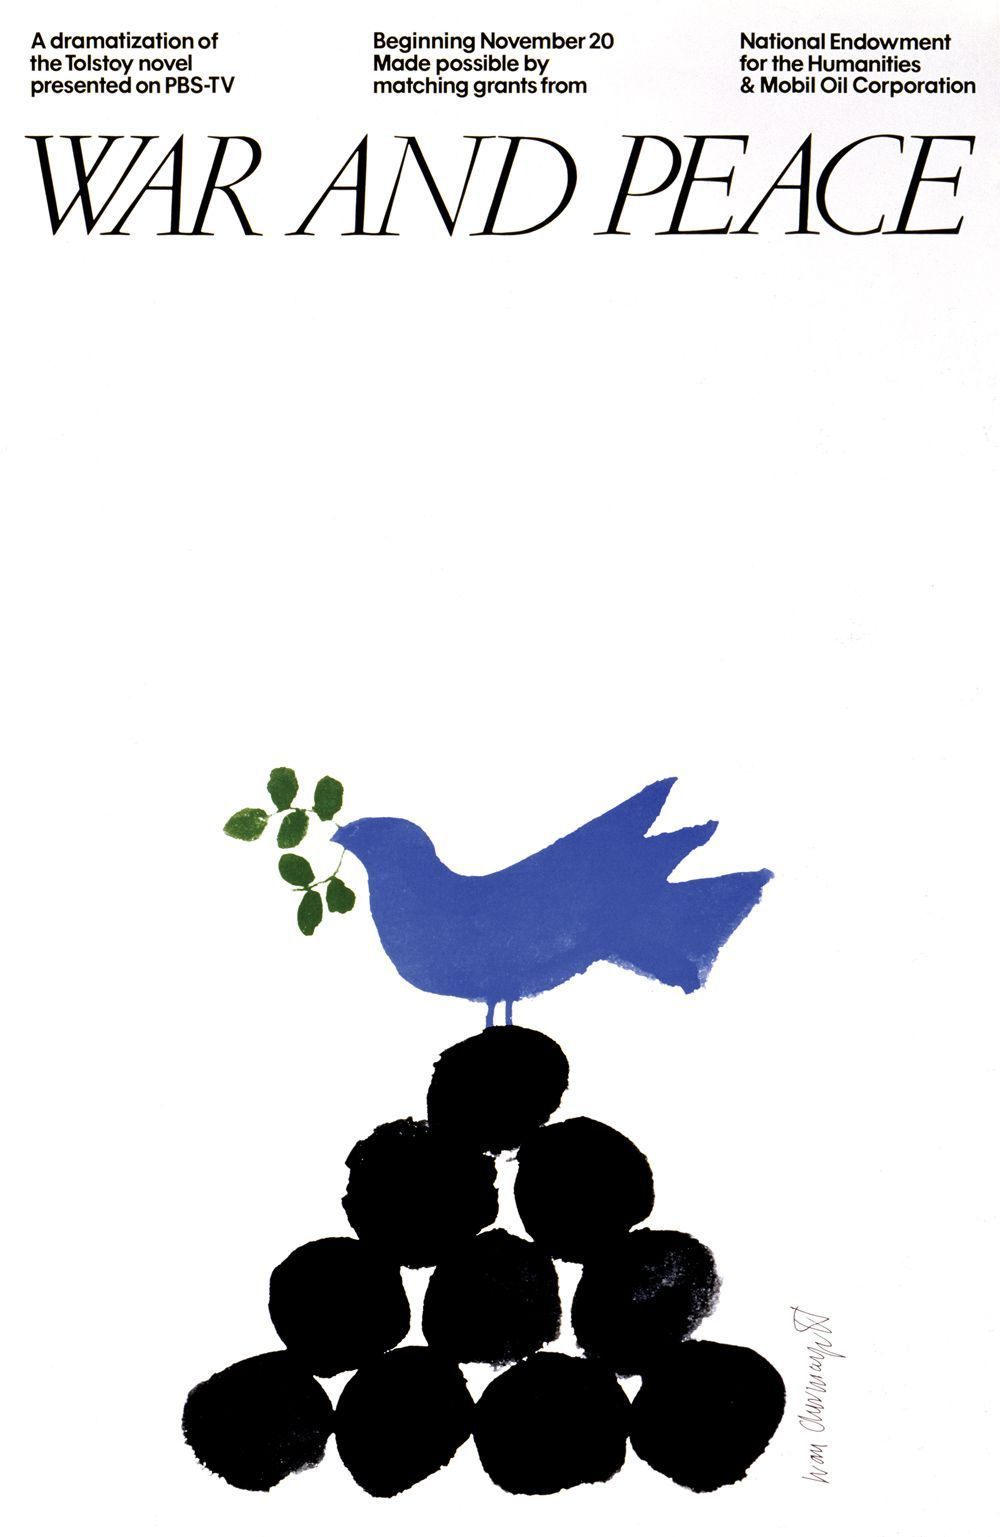 chermayeff logo bigumigu